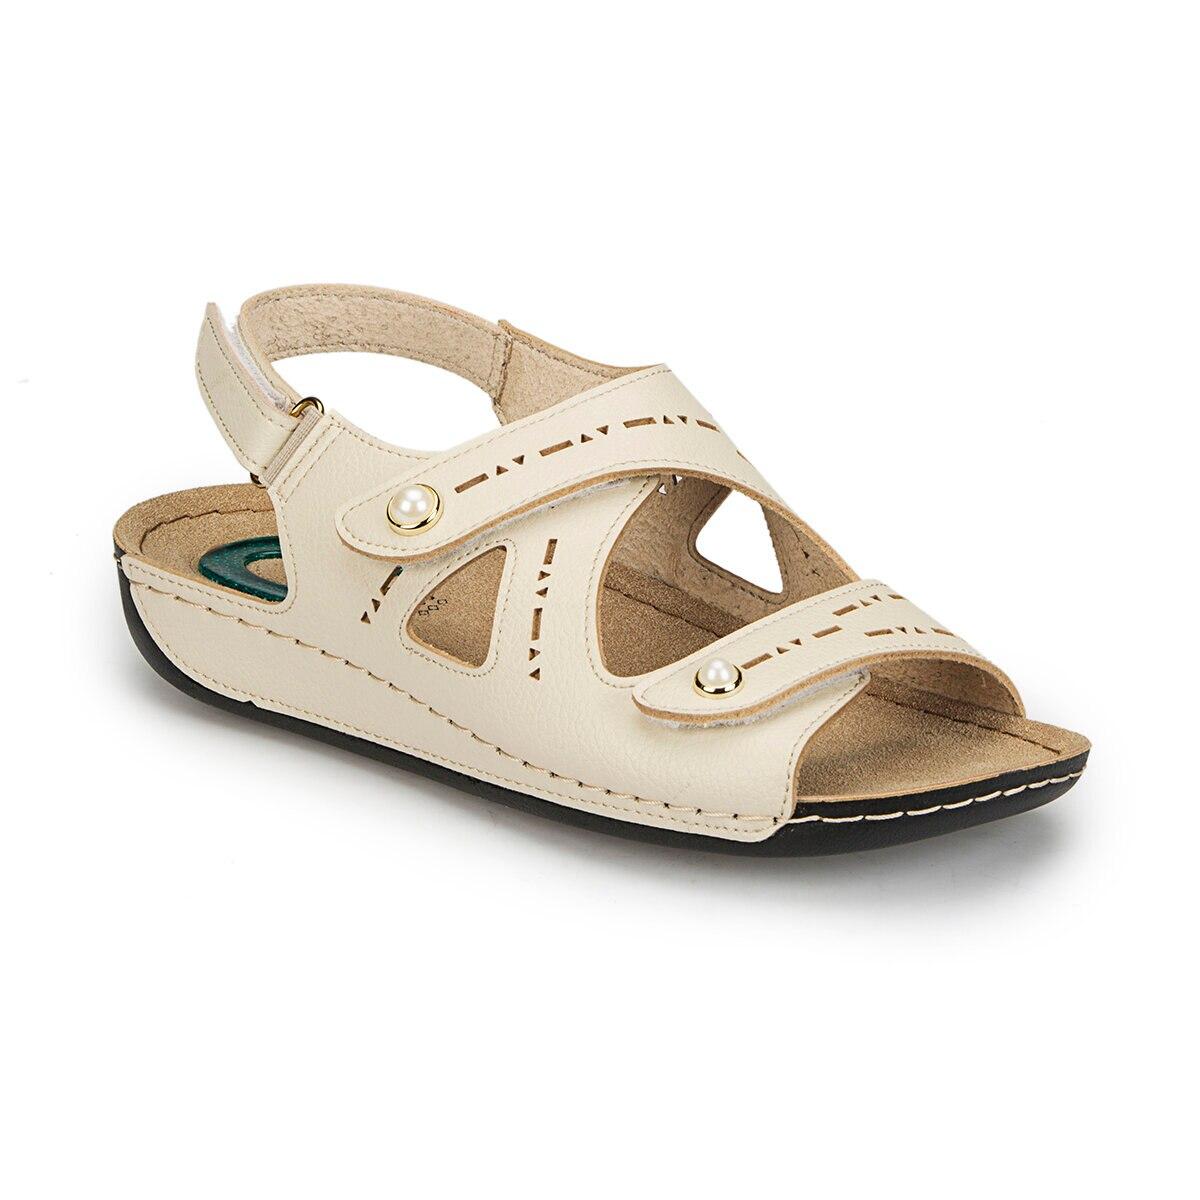 FLO 81.158557.Z Beige Women Basic Comfort Polaris